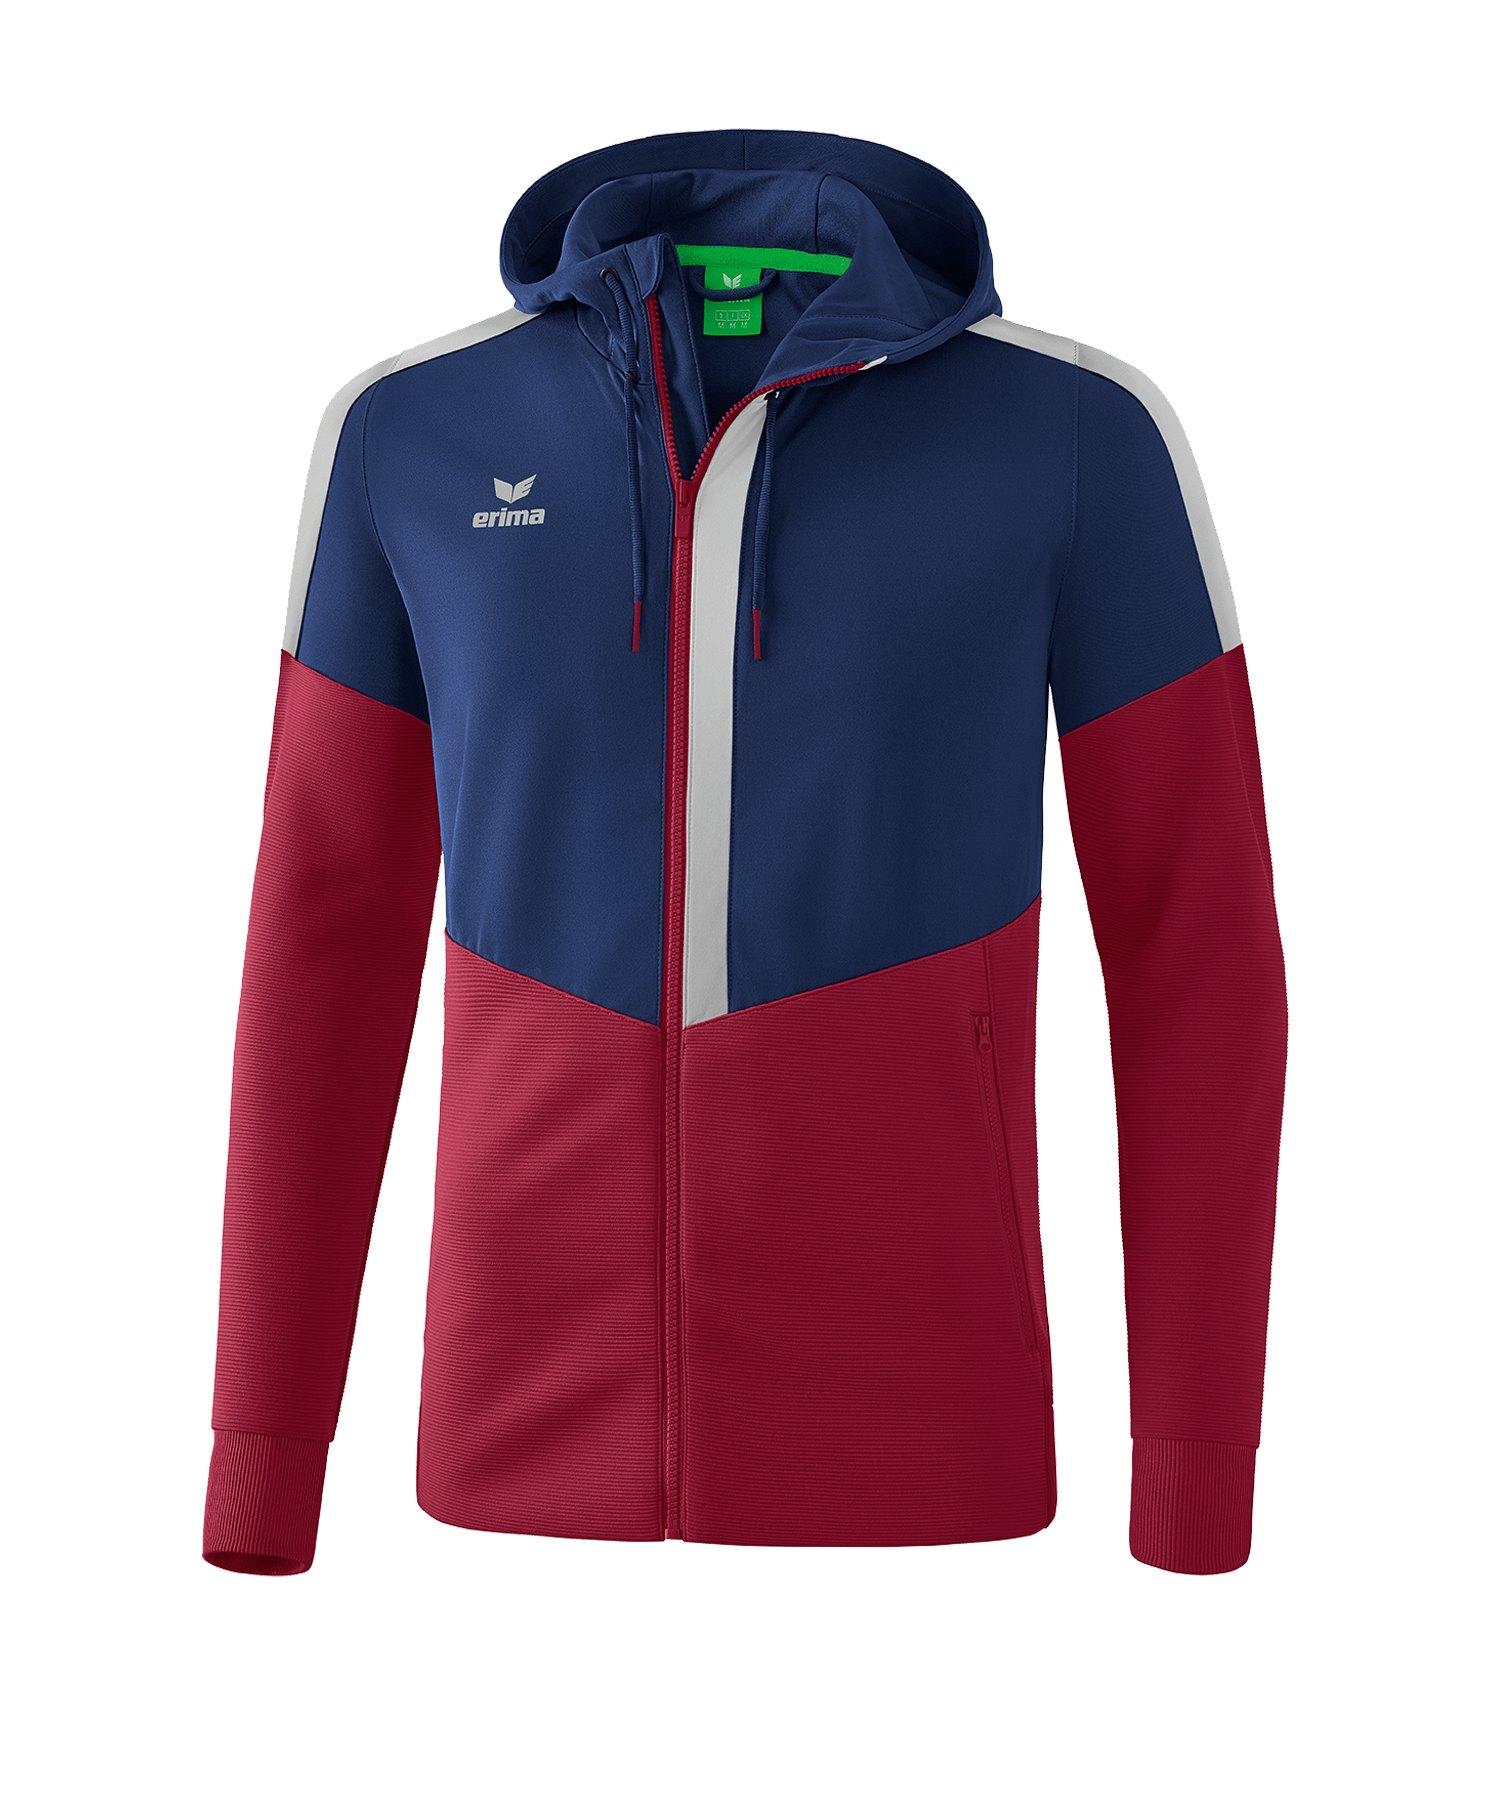 Erima Squad Kapuzen-Trainingsjacke Blau Rot - blau